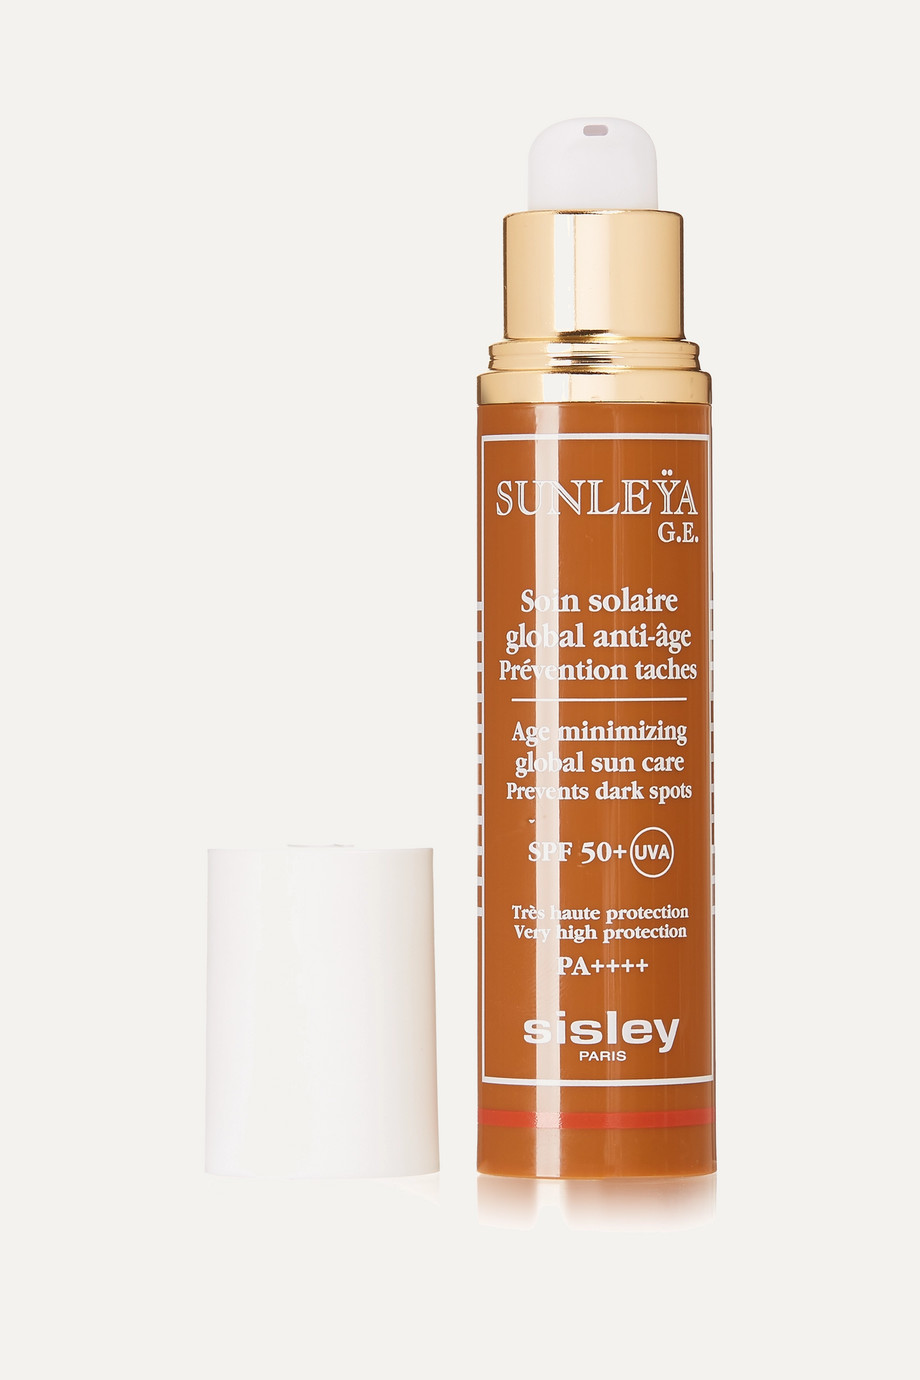 Sisley Sunleÿa G.E. Age Minimizing Global Sun Care LSF 50, 50 ml – Sonnencreme